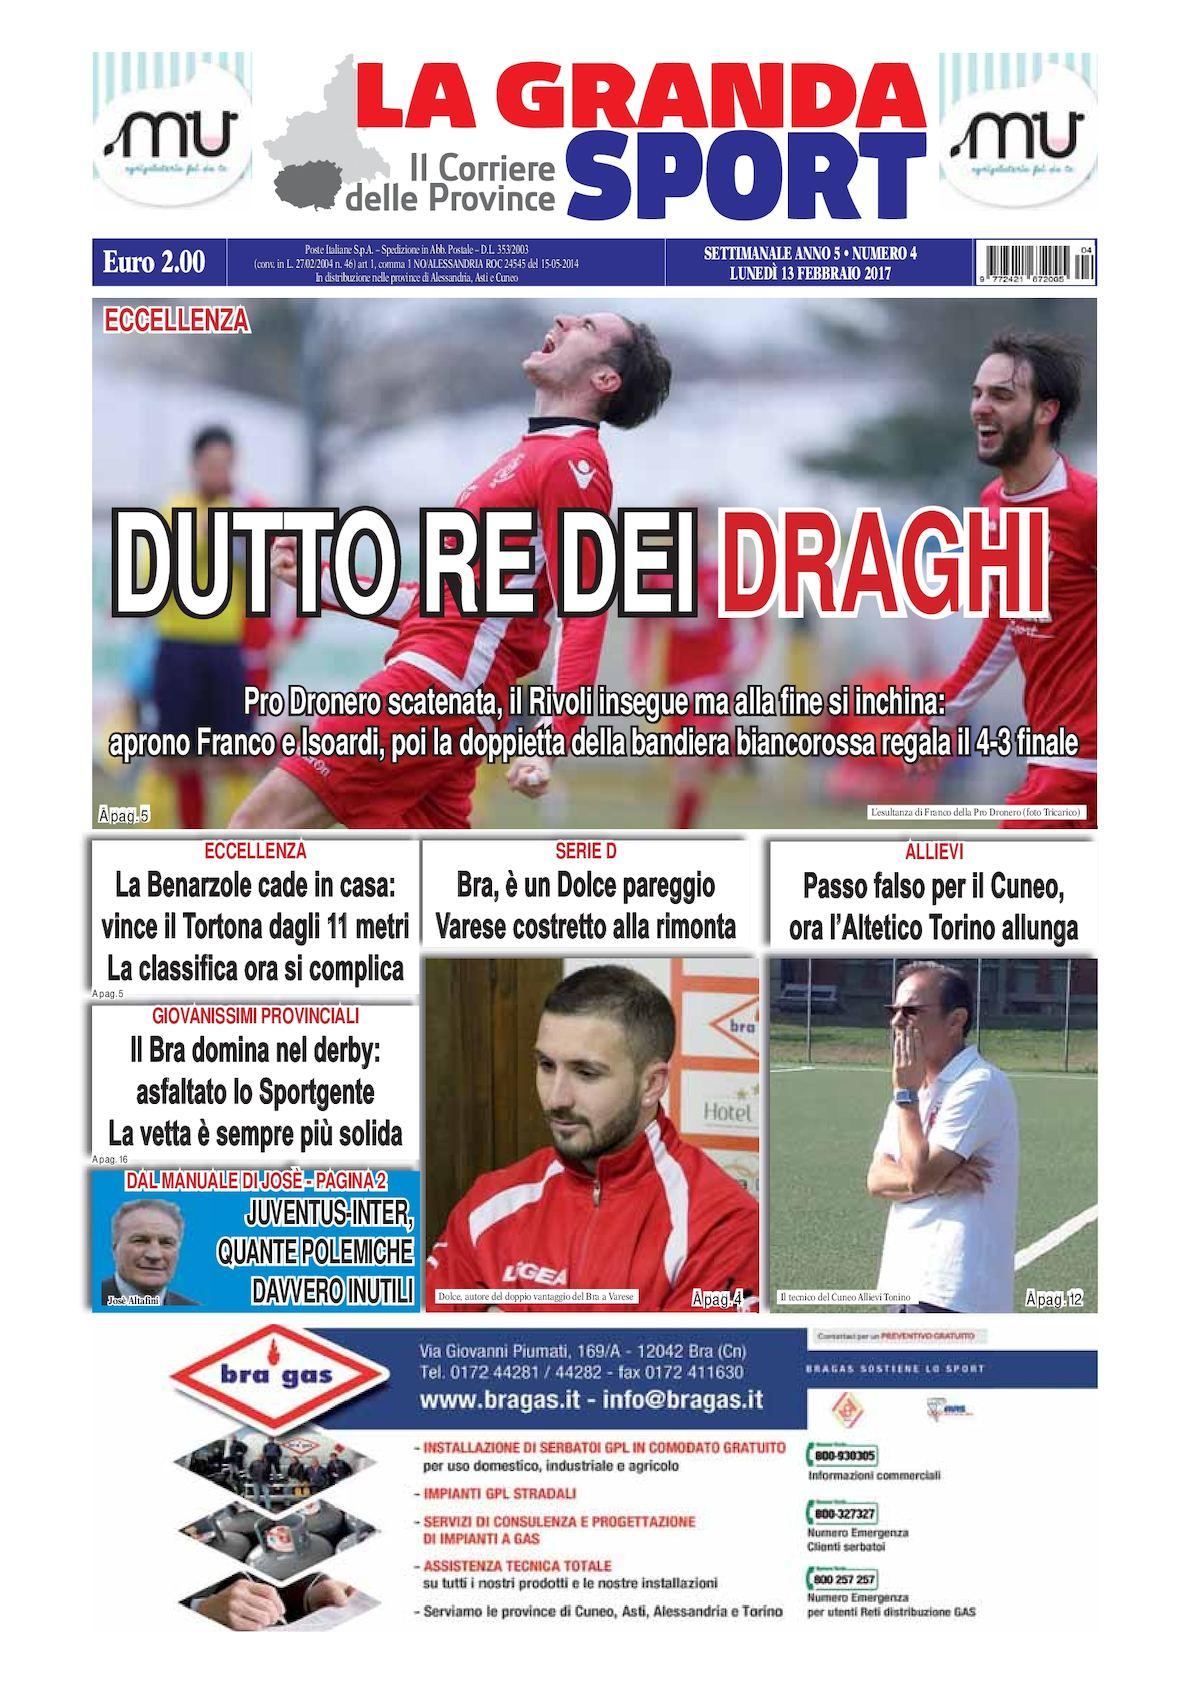 04 La Sport Granda 2017 Calaméo WUaTOc8An